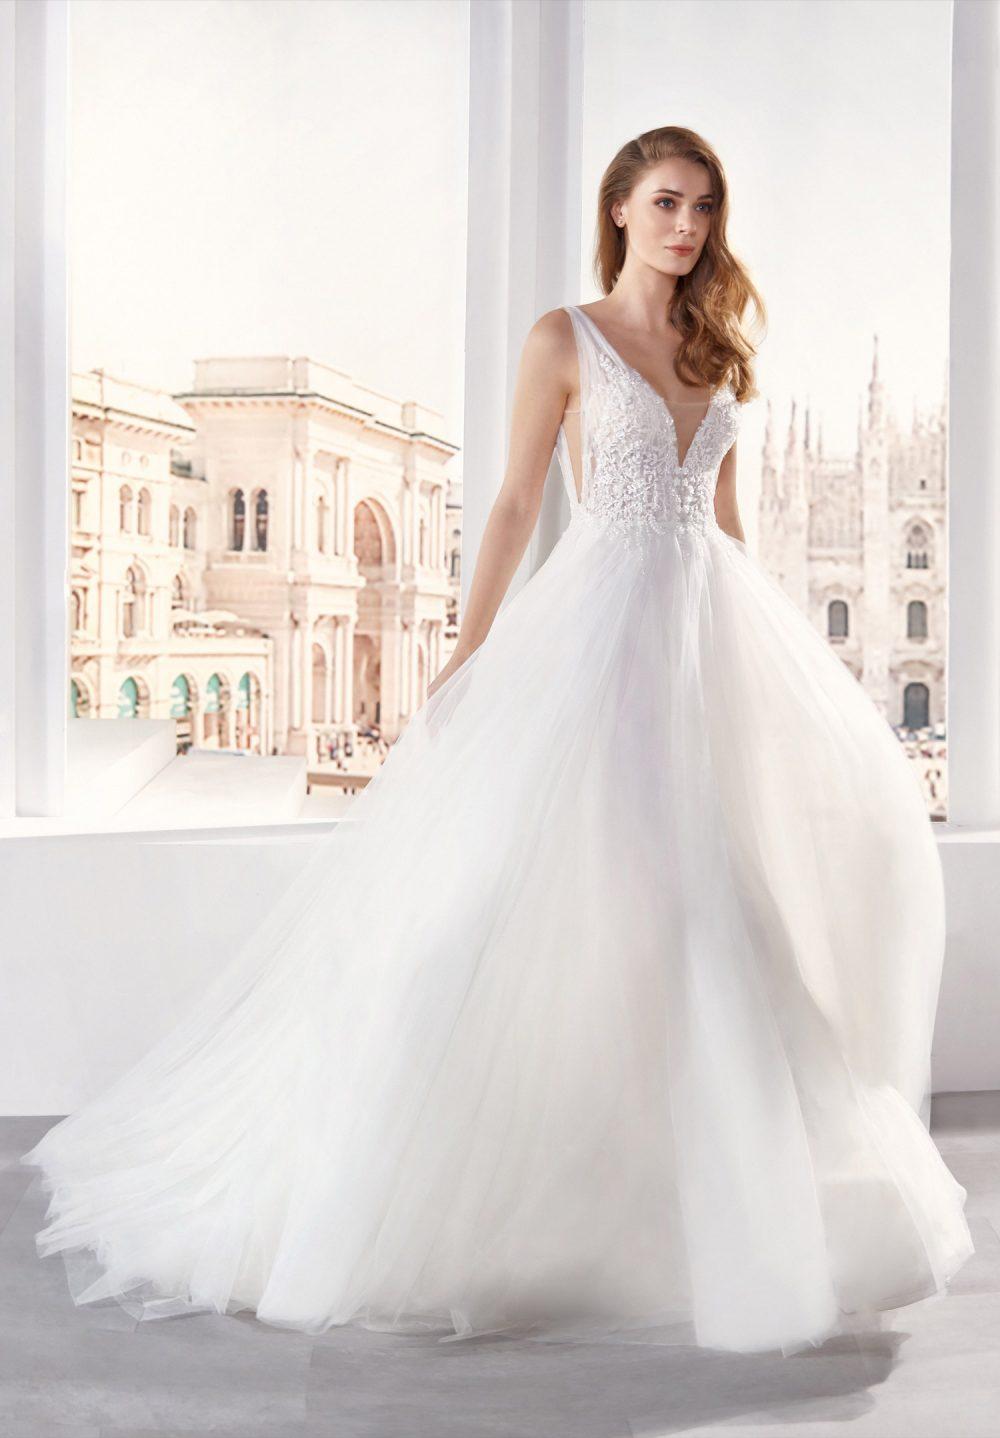 Mariages: abito da sposa Jolies 2021 a Vicenza, Verona, Padova, Veneto JO12139